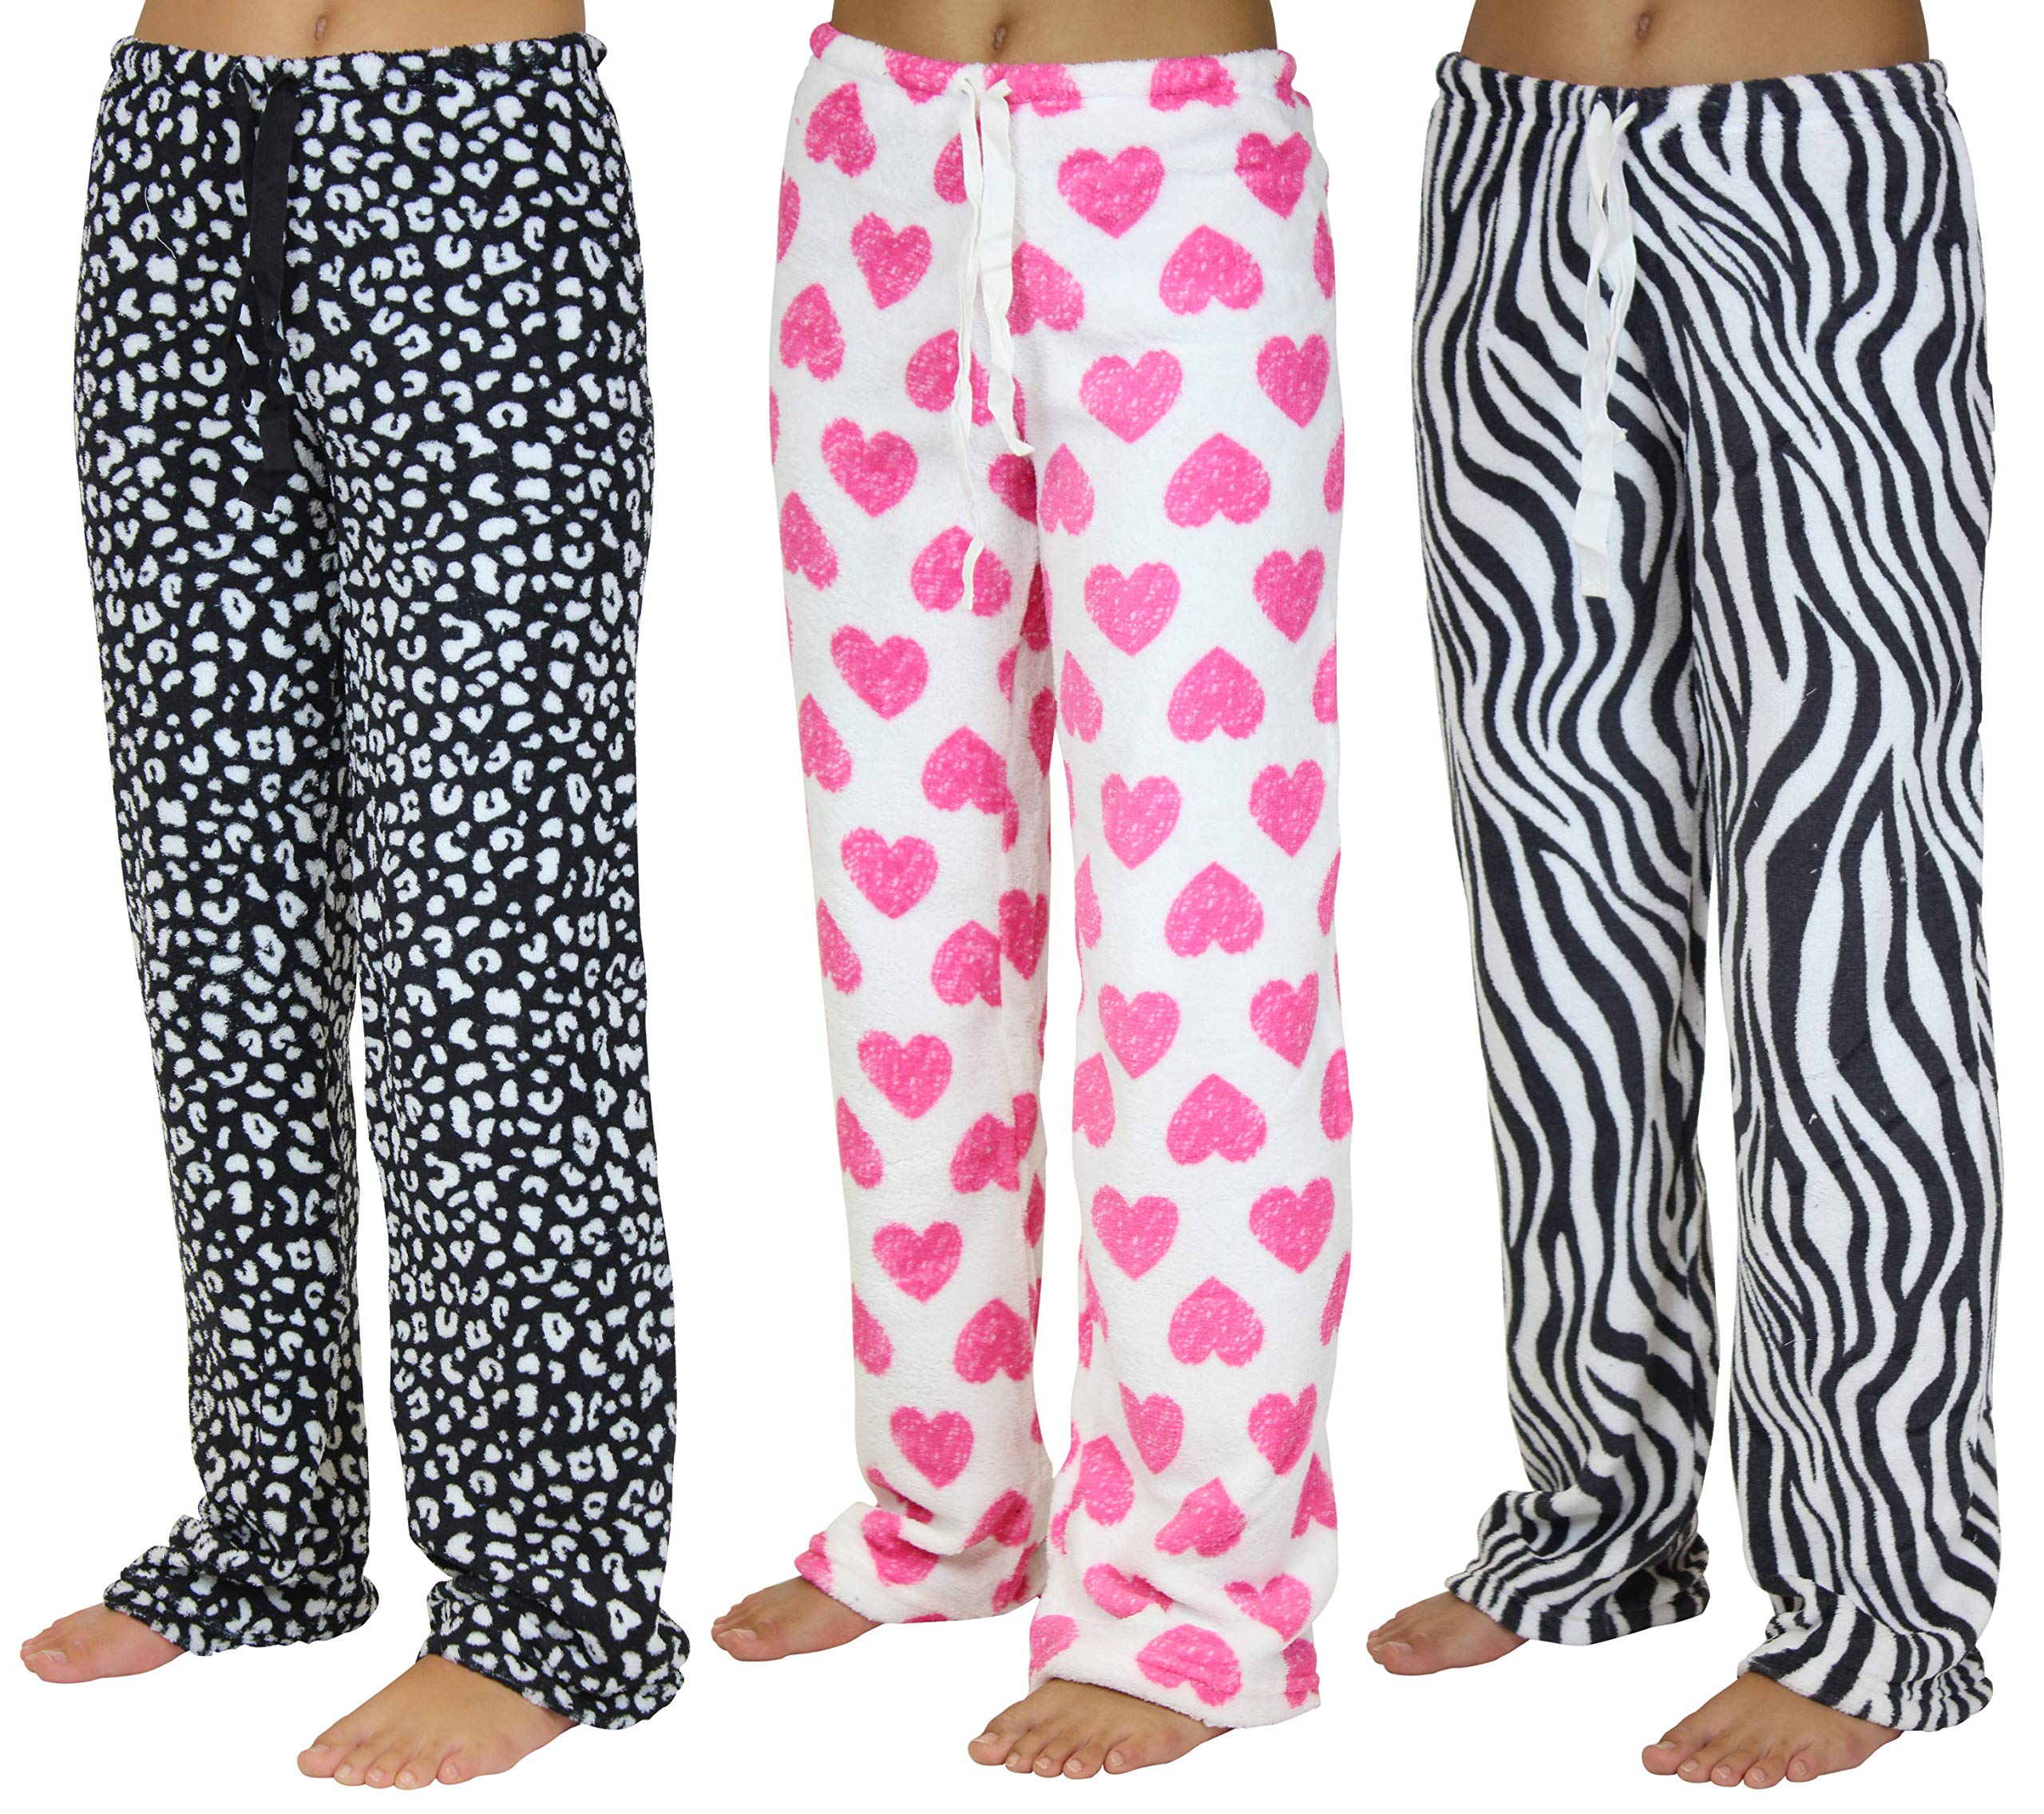 3 Pack:women'S Super-Soft Plush Fleece Pajama/Lounge Pants - Sloth Pajamas (Pj'S)